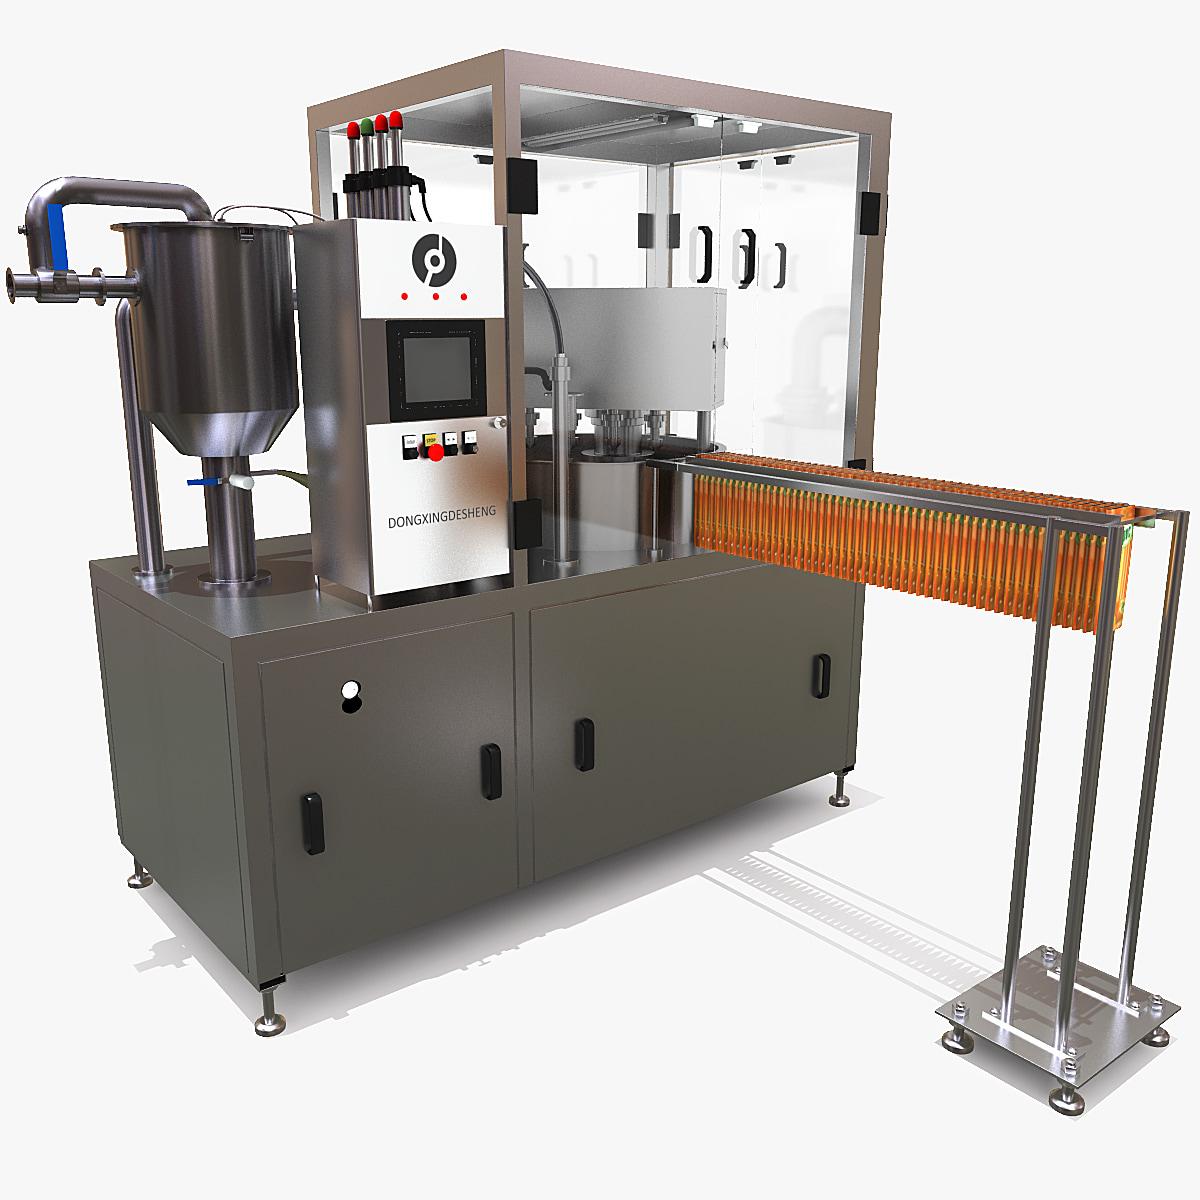 Factory_Food_Packing_Machine_00.jpg